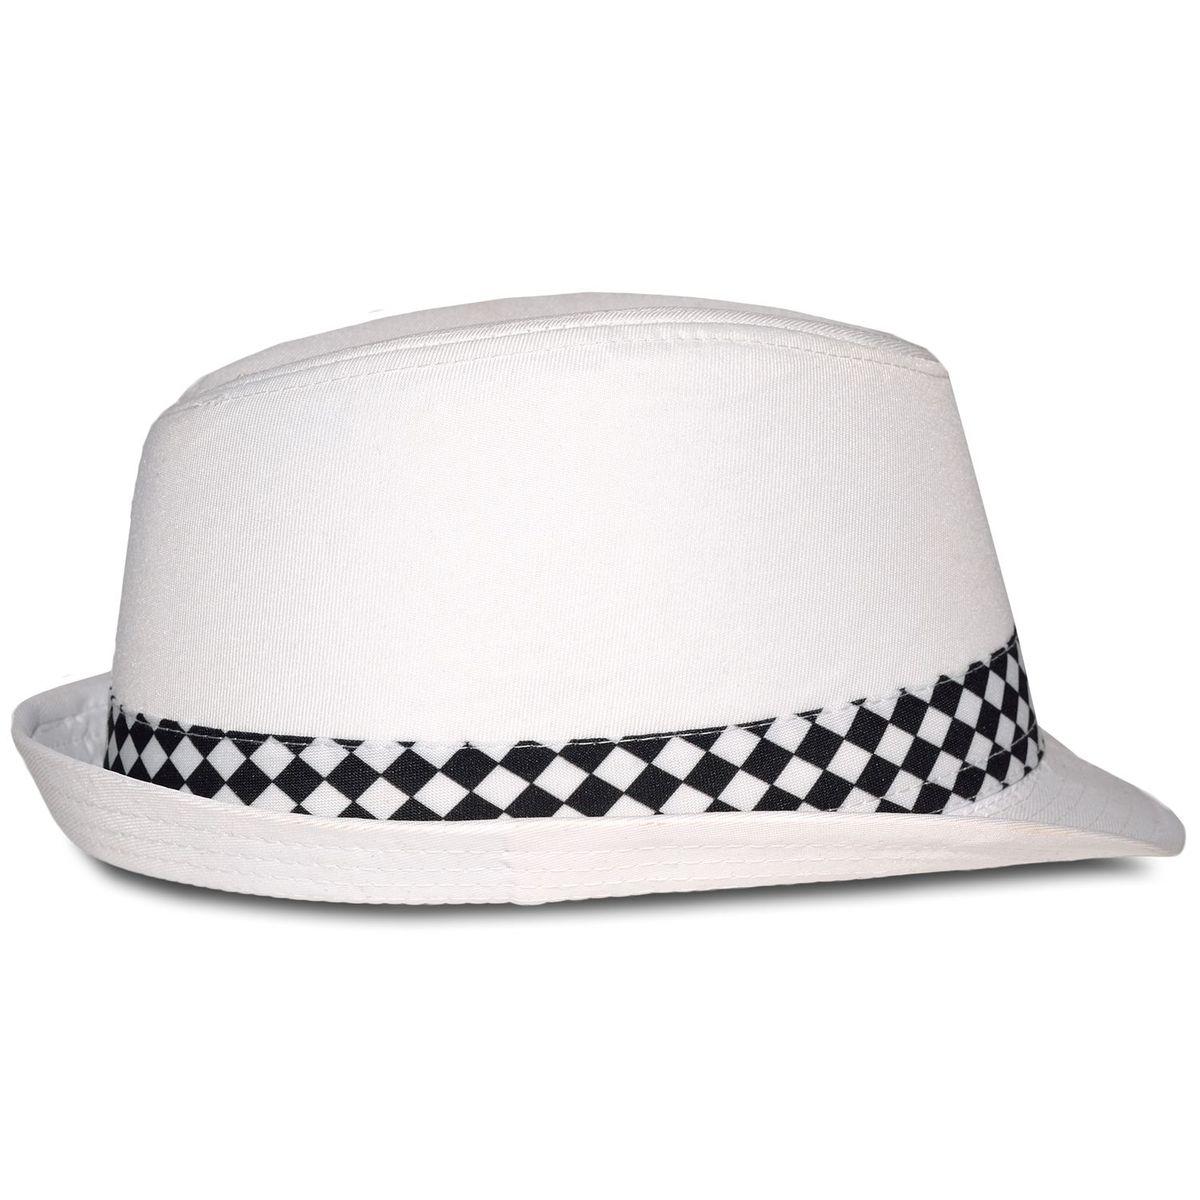 Chapeau trilby